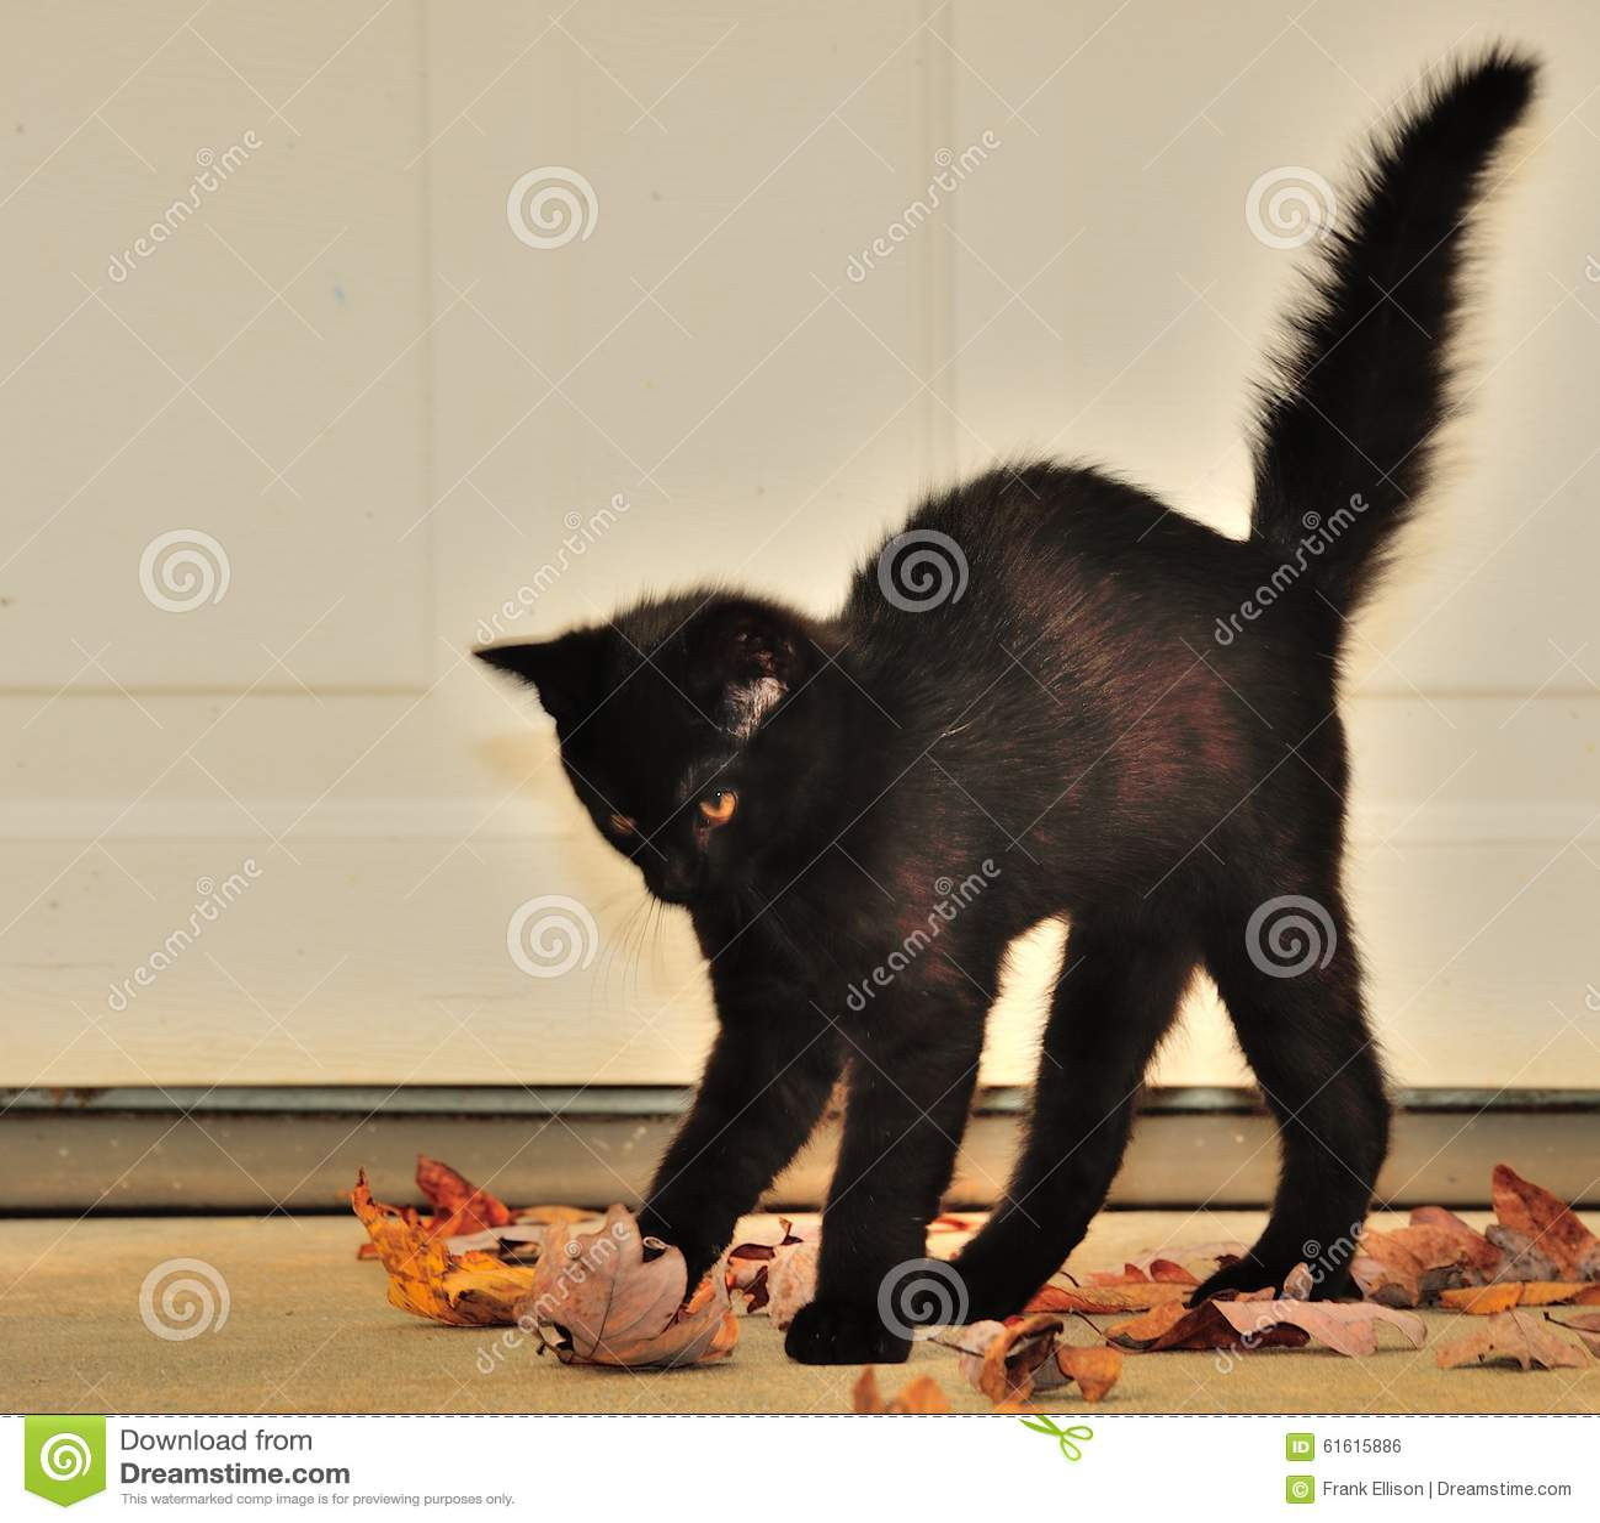 black halloween cat stock photo. image of pumpkin, bright - 61615886